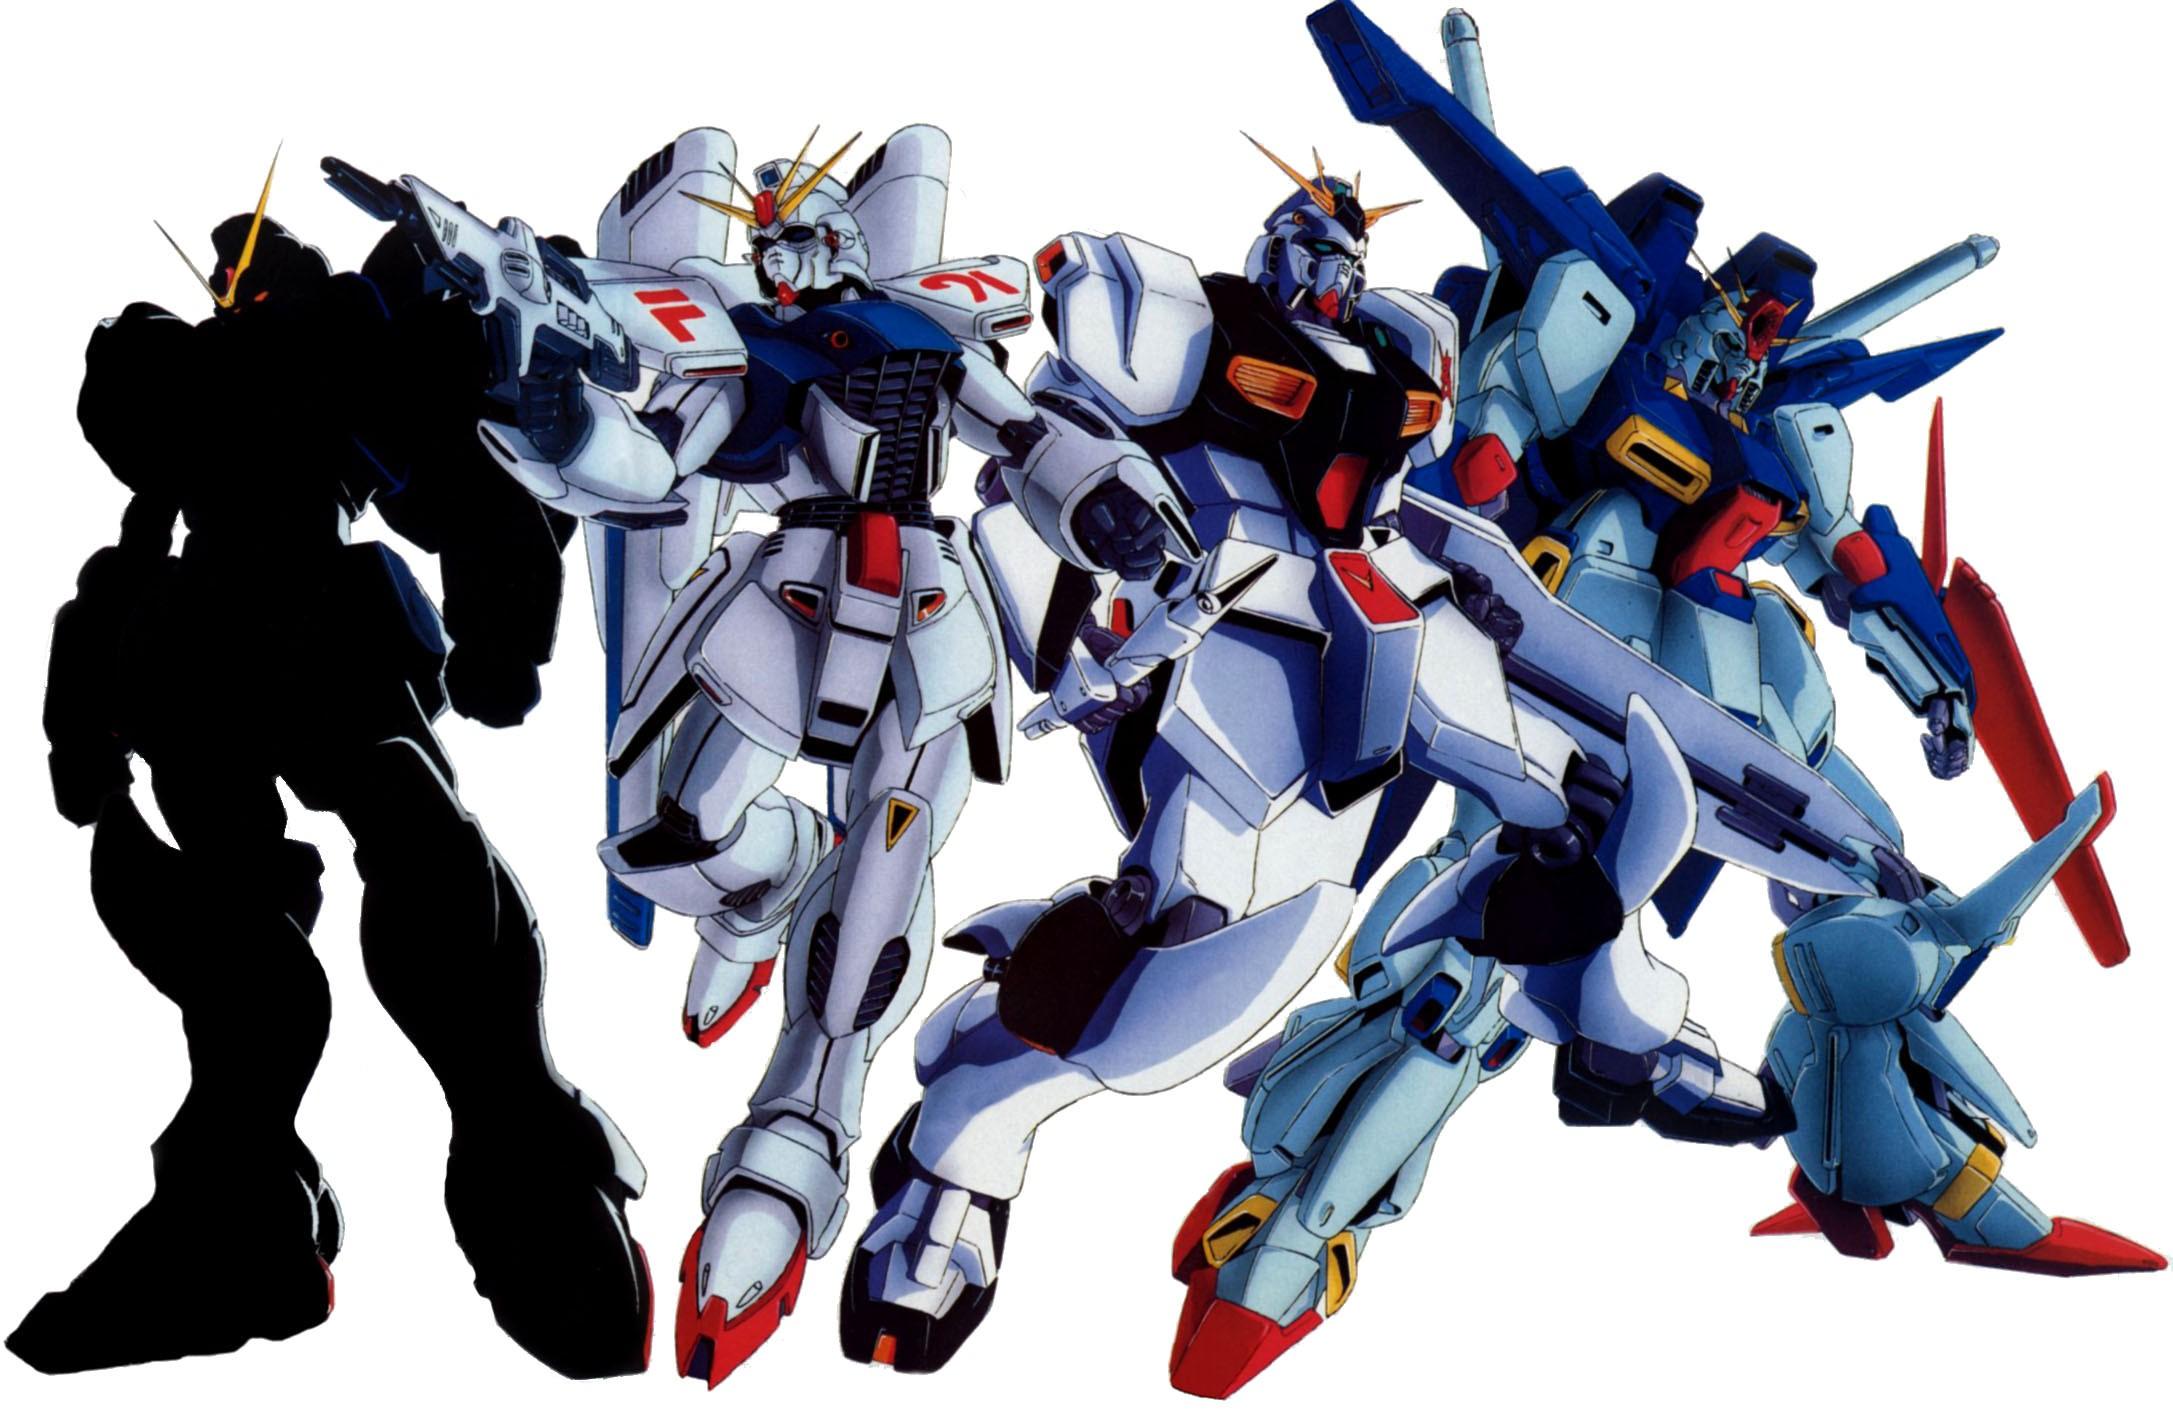 Wallpaper Illustration Anime Mobile Suit Gundam Toy Machine